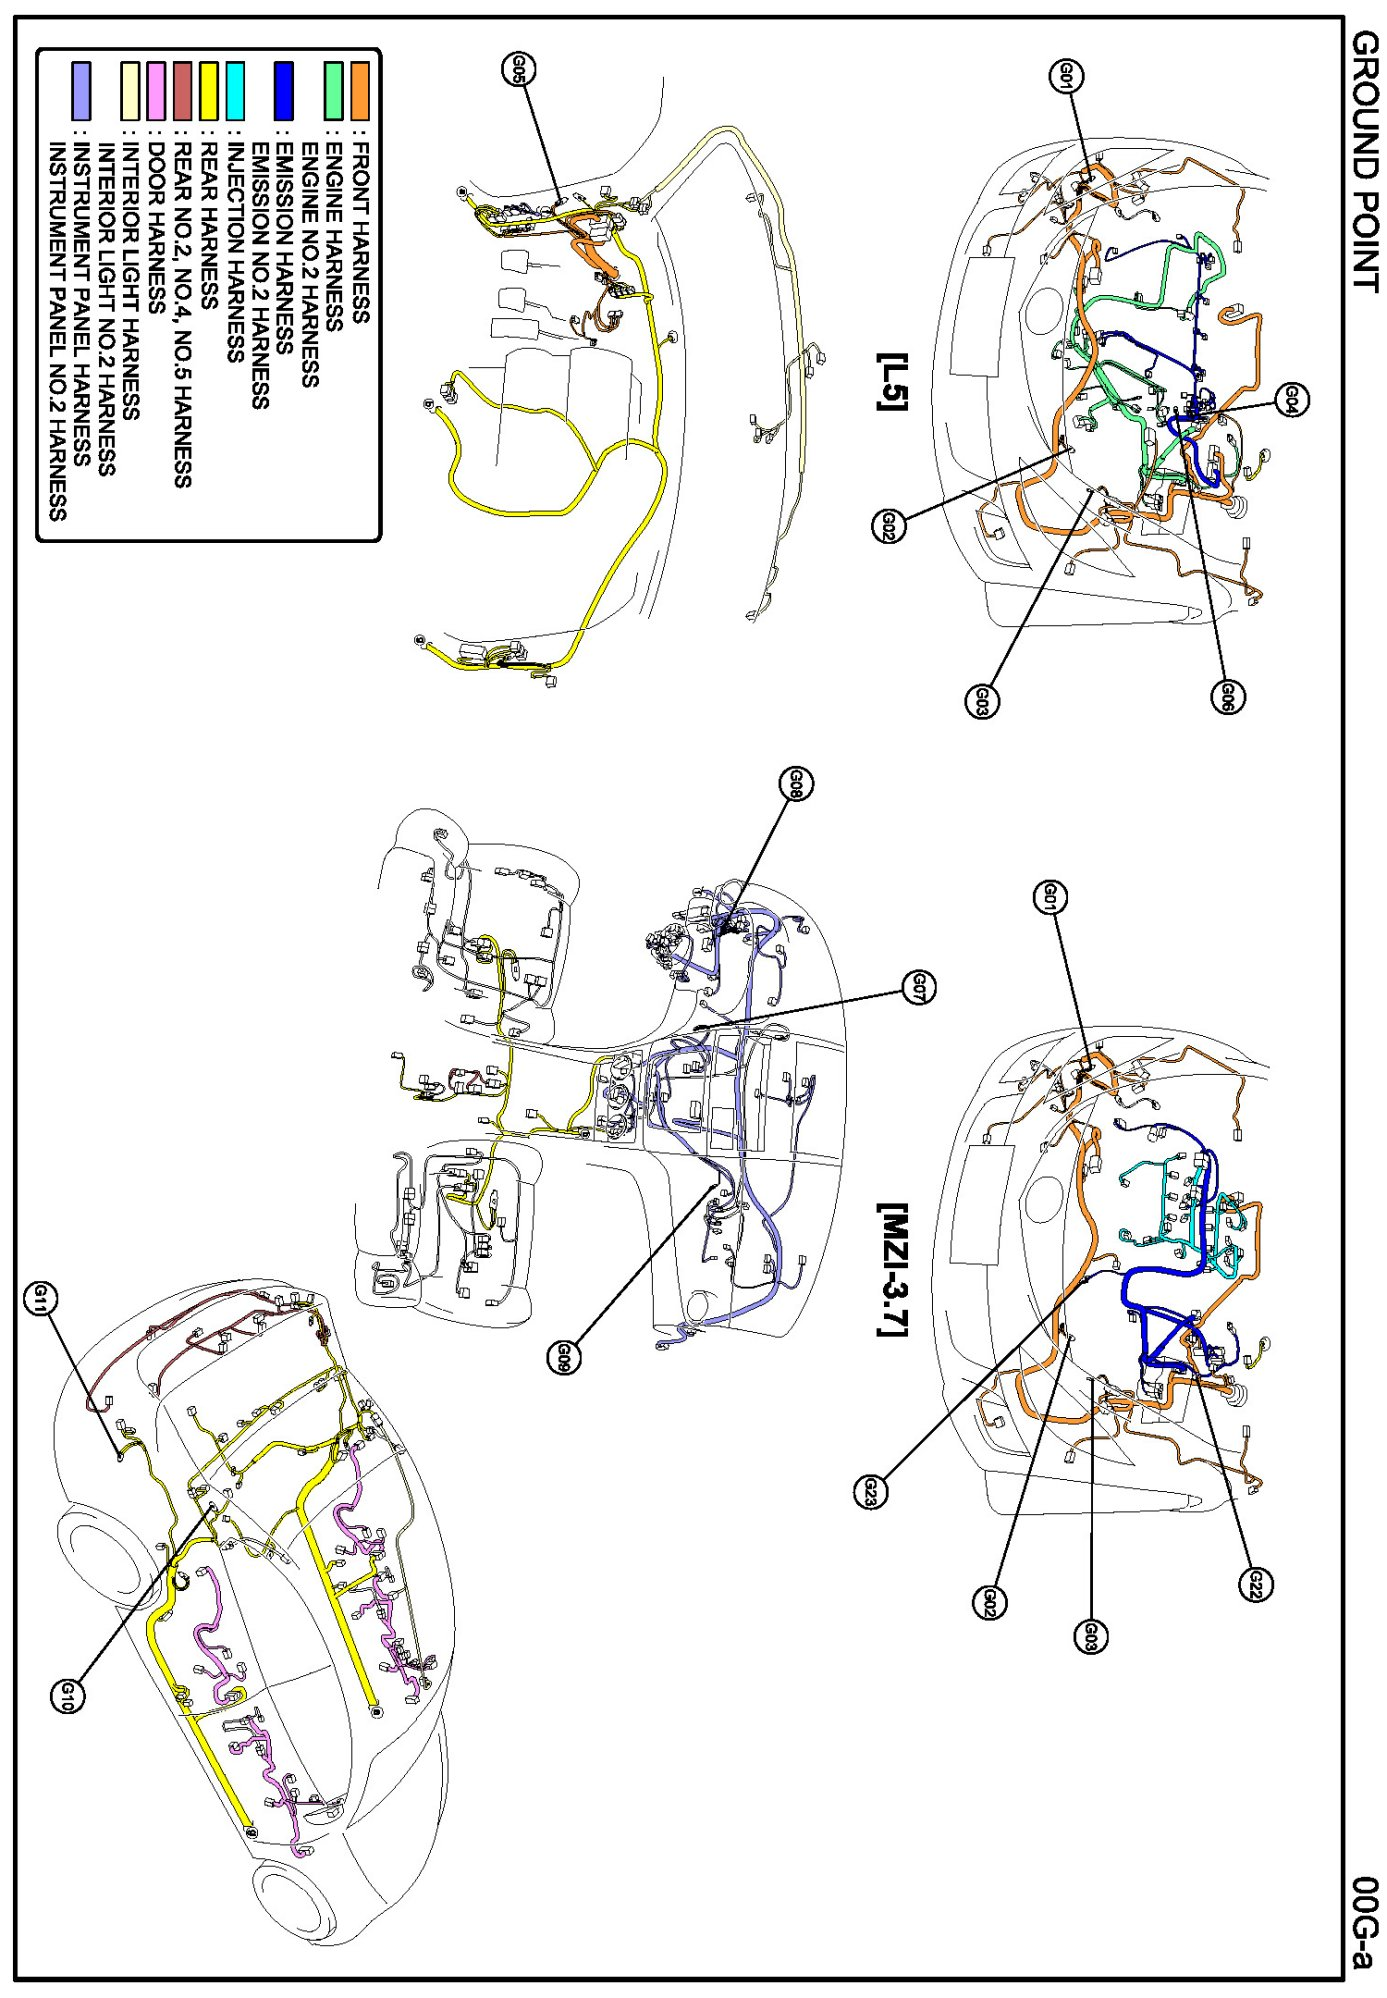 I Got Bad Squeaking On My 1999 Dodge Durango When Driving The Road 572 Hemi Engine Diagram Figure 9